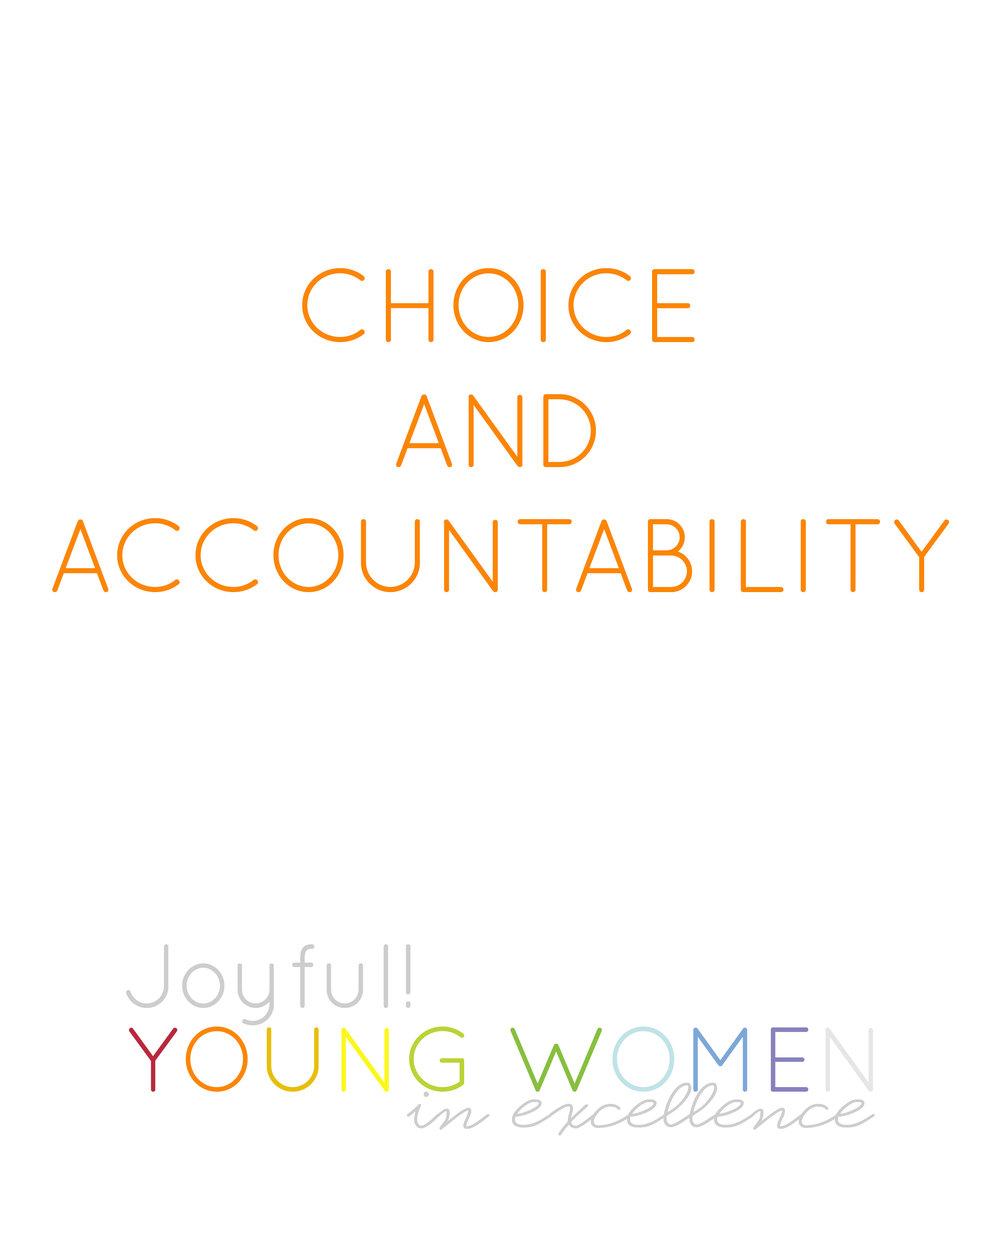 Amber Brittain-Hale November 2016 Choice and Accountability.jpg